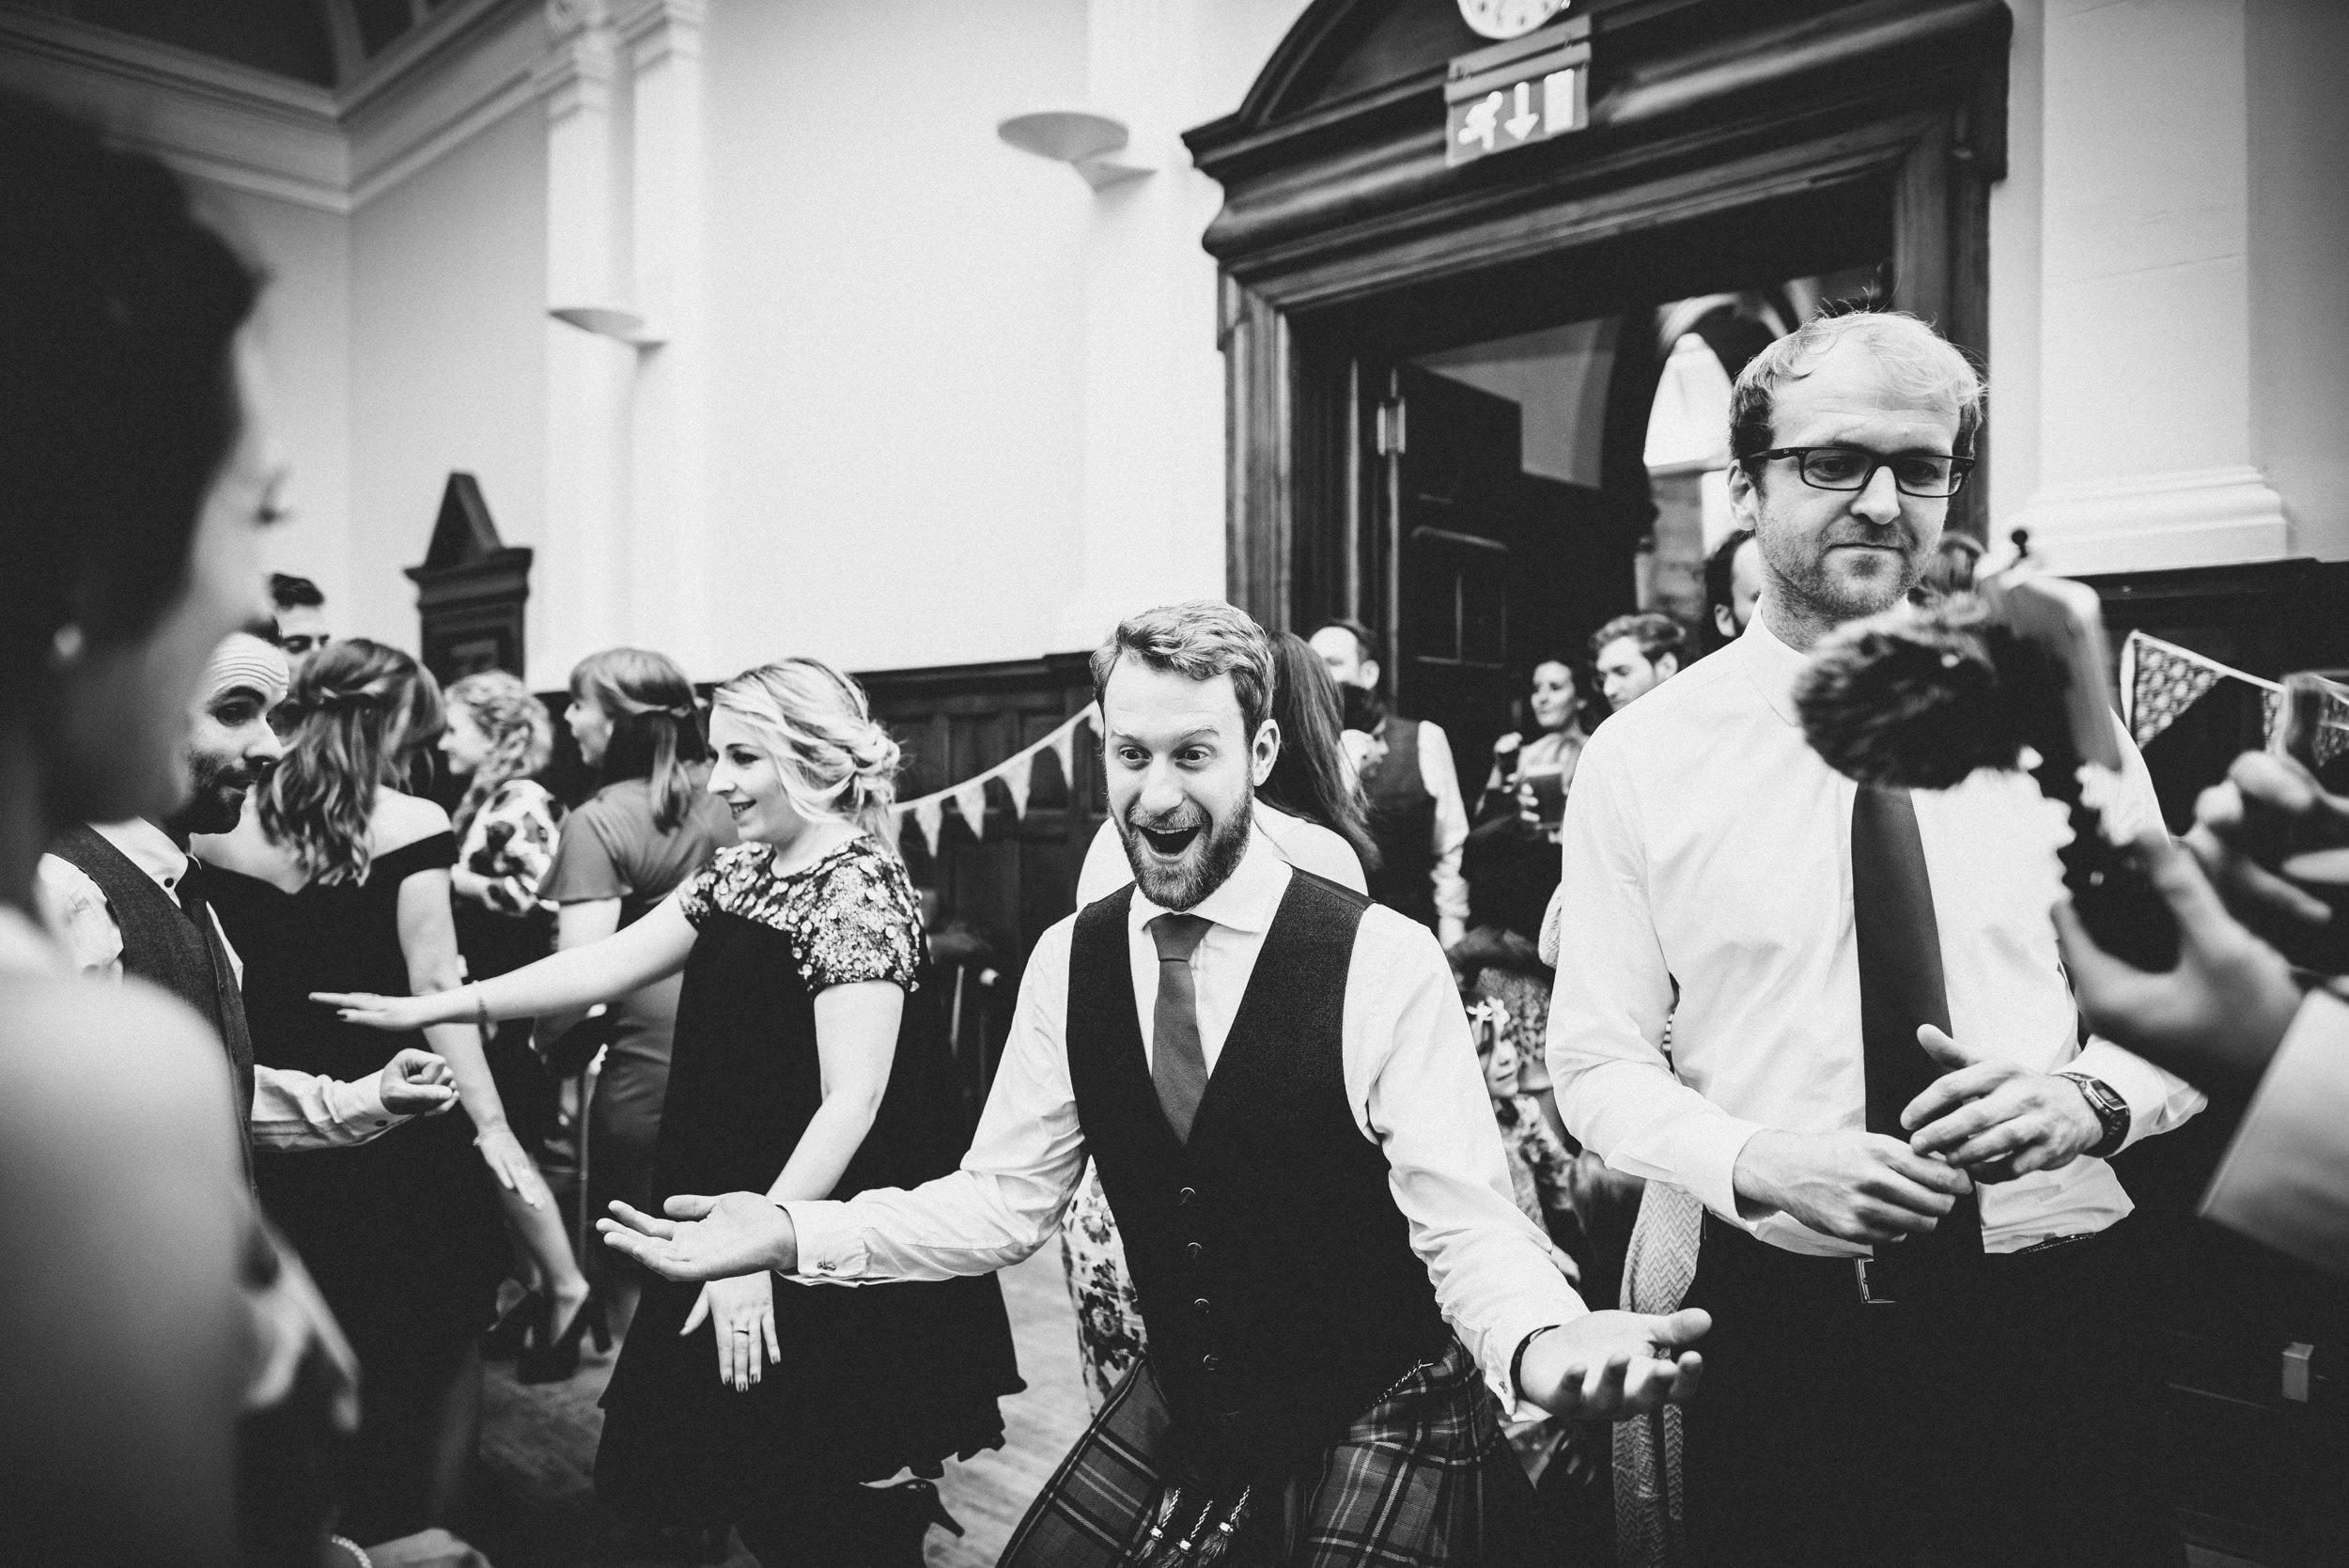 0183-alternative-wedding-portrait-family-kids-photographer-glasgow-scotland.JPG